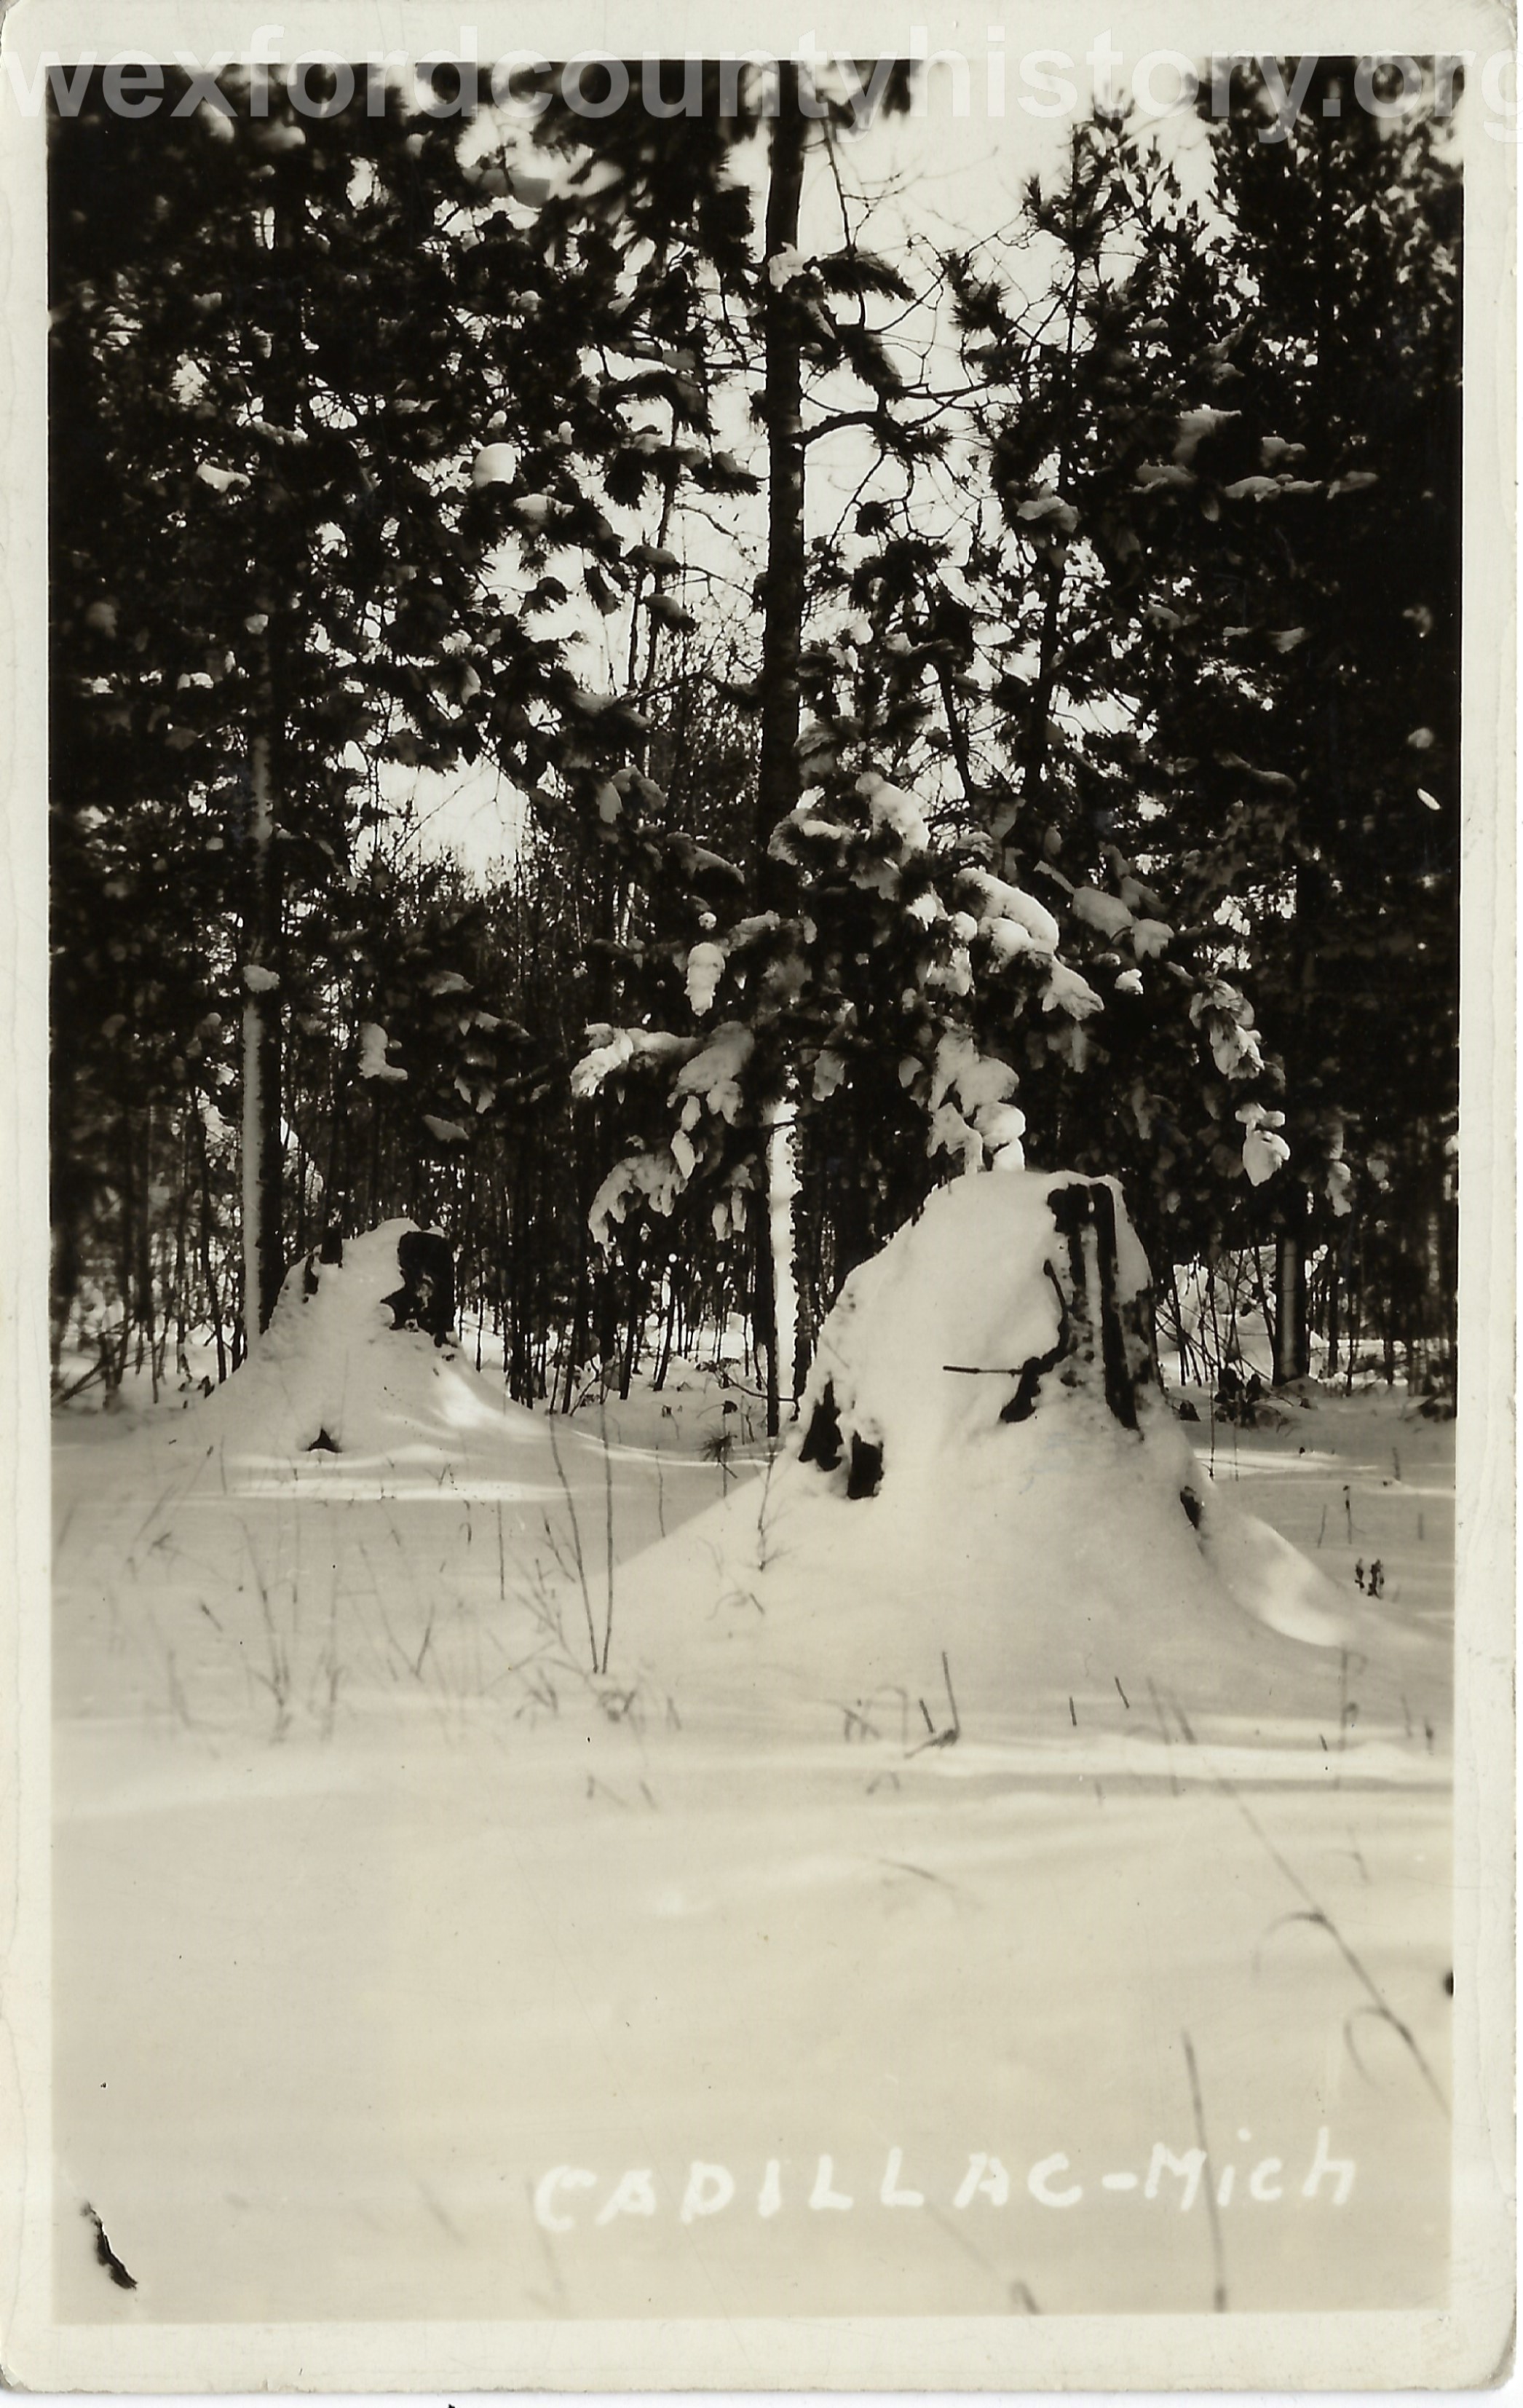 Cadillac-Weather-Winter-Scene-13